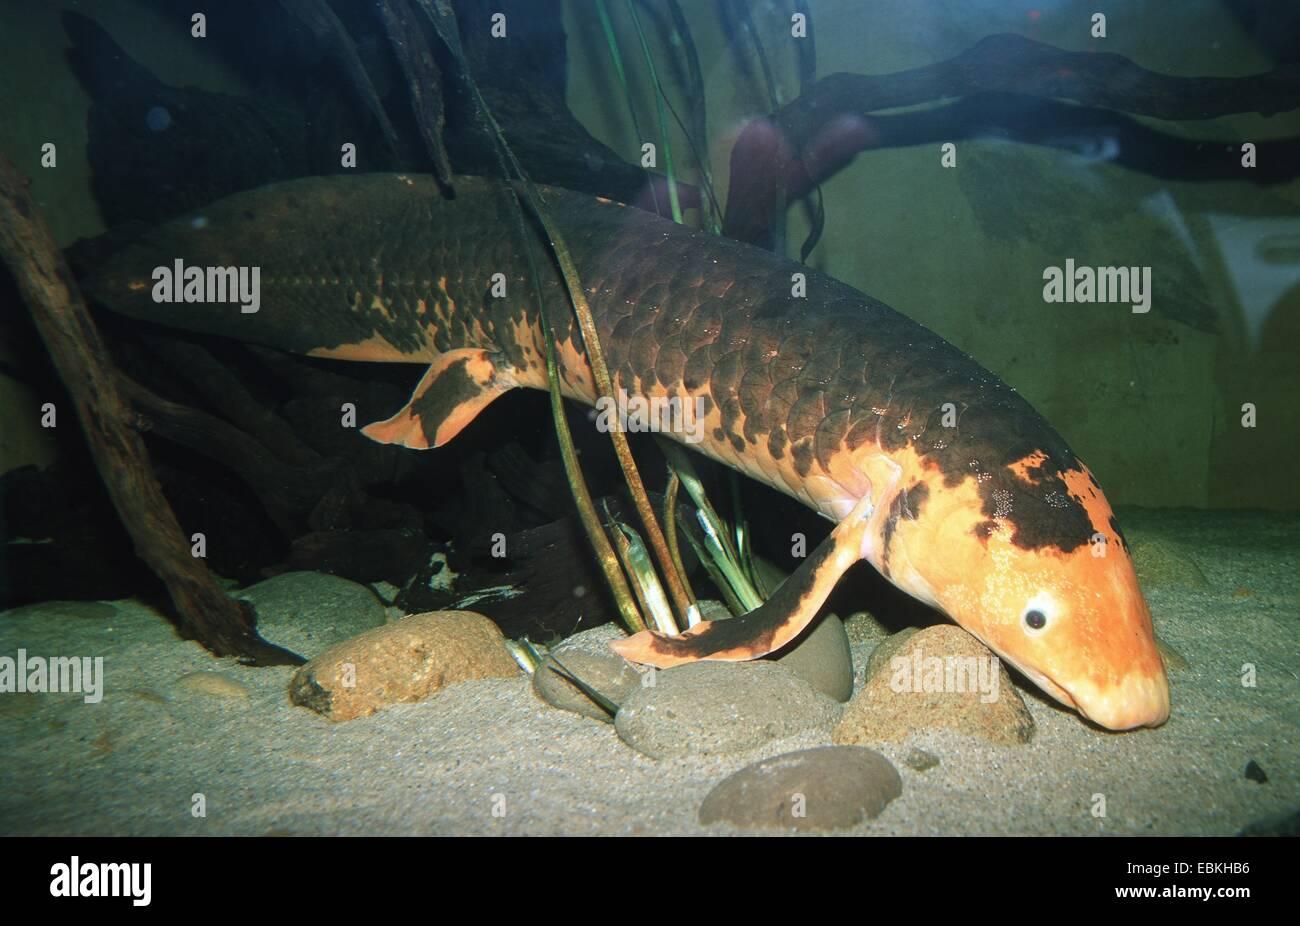 Australian lungfish (Neoceratodus forsteri) - Stock Image